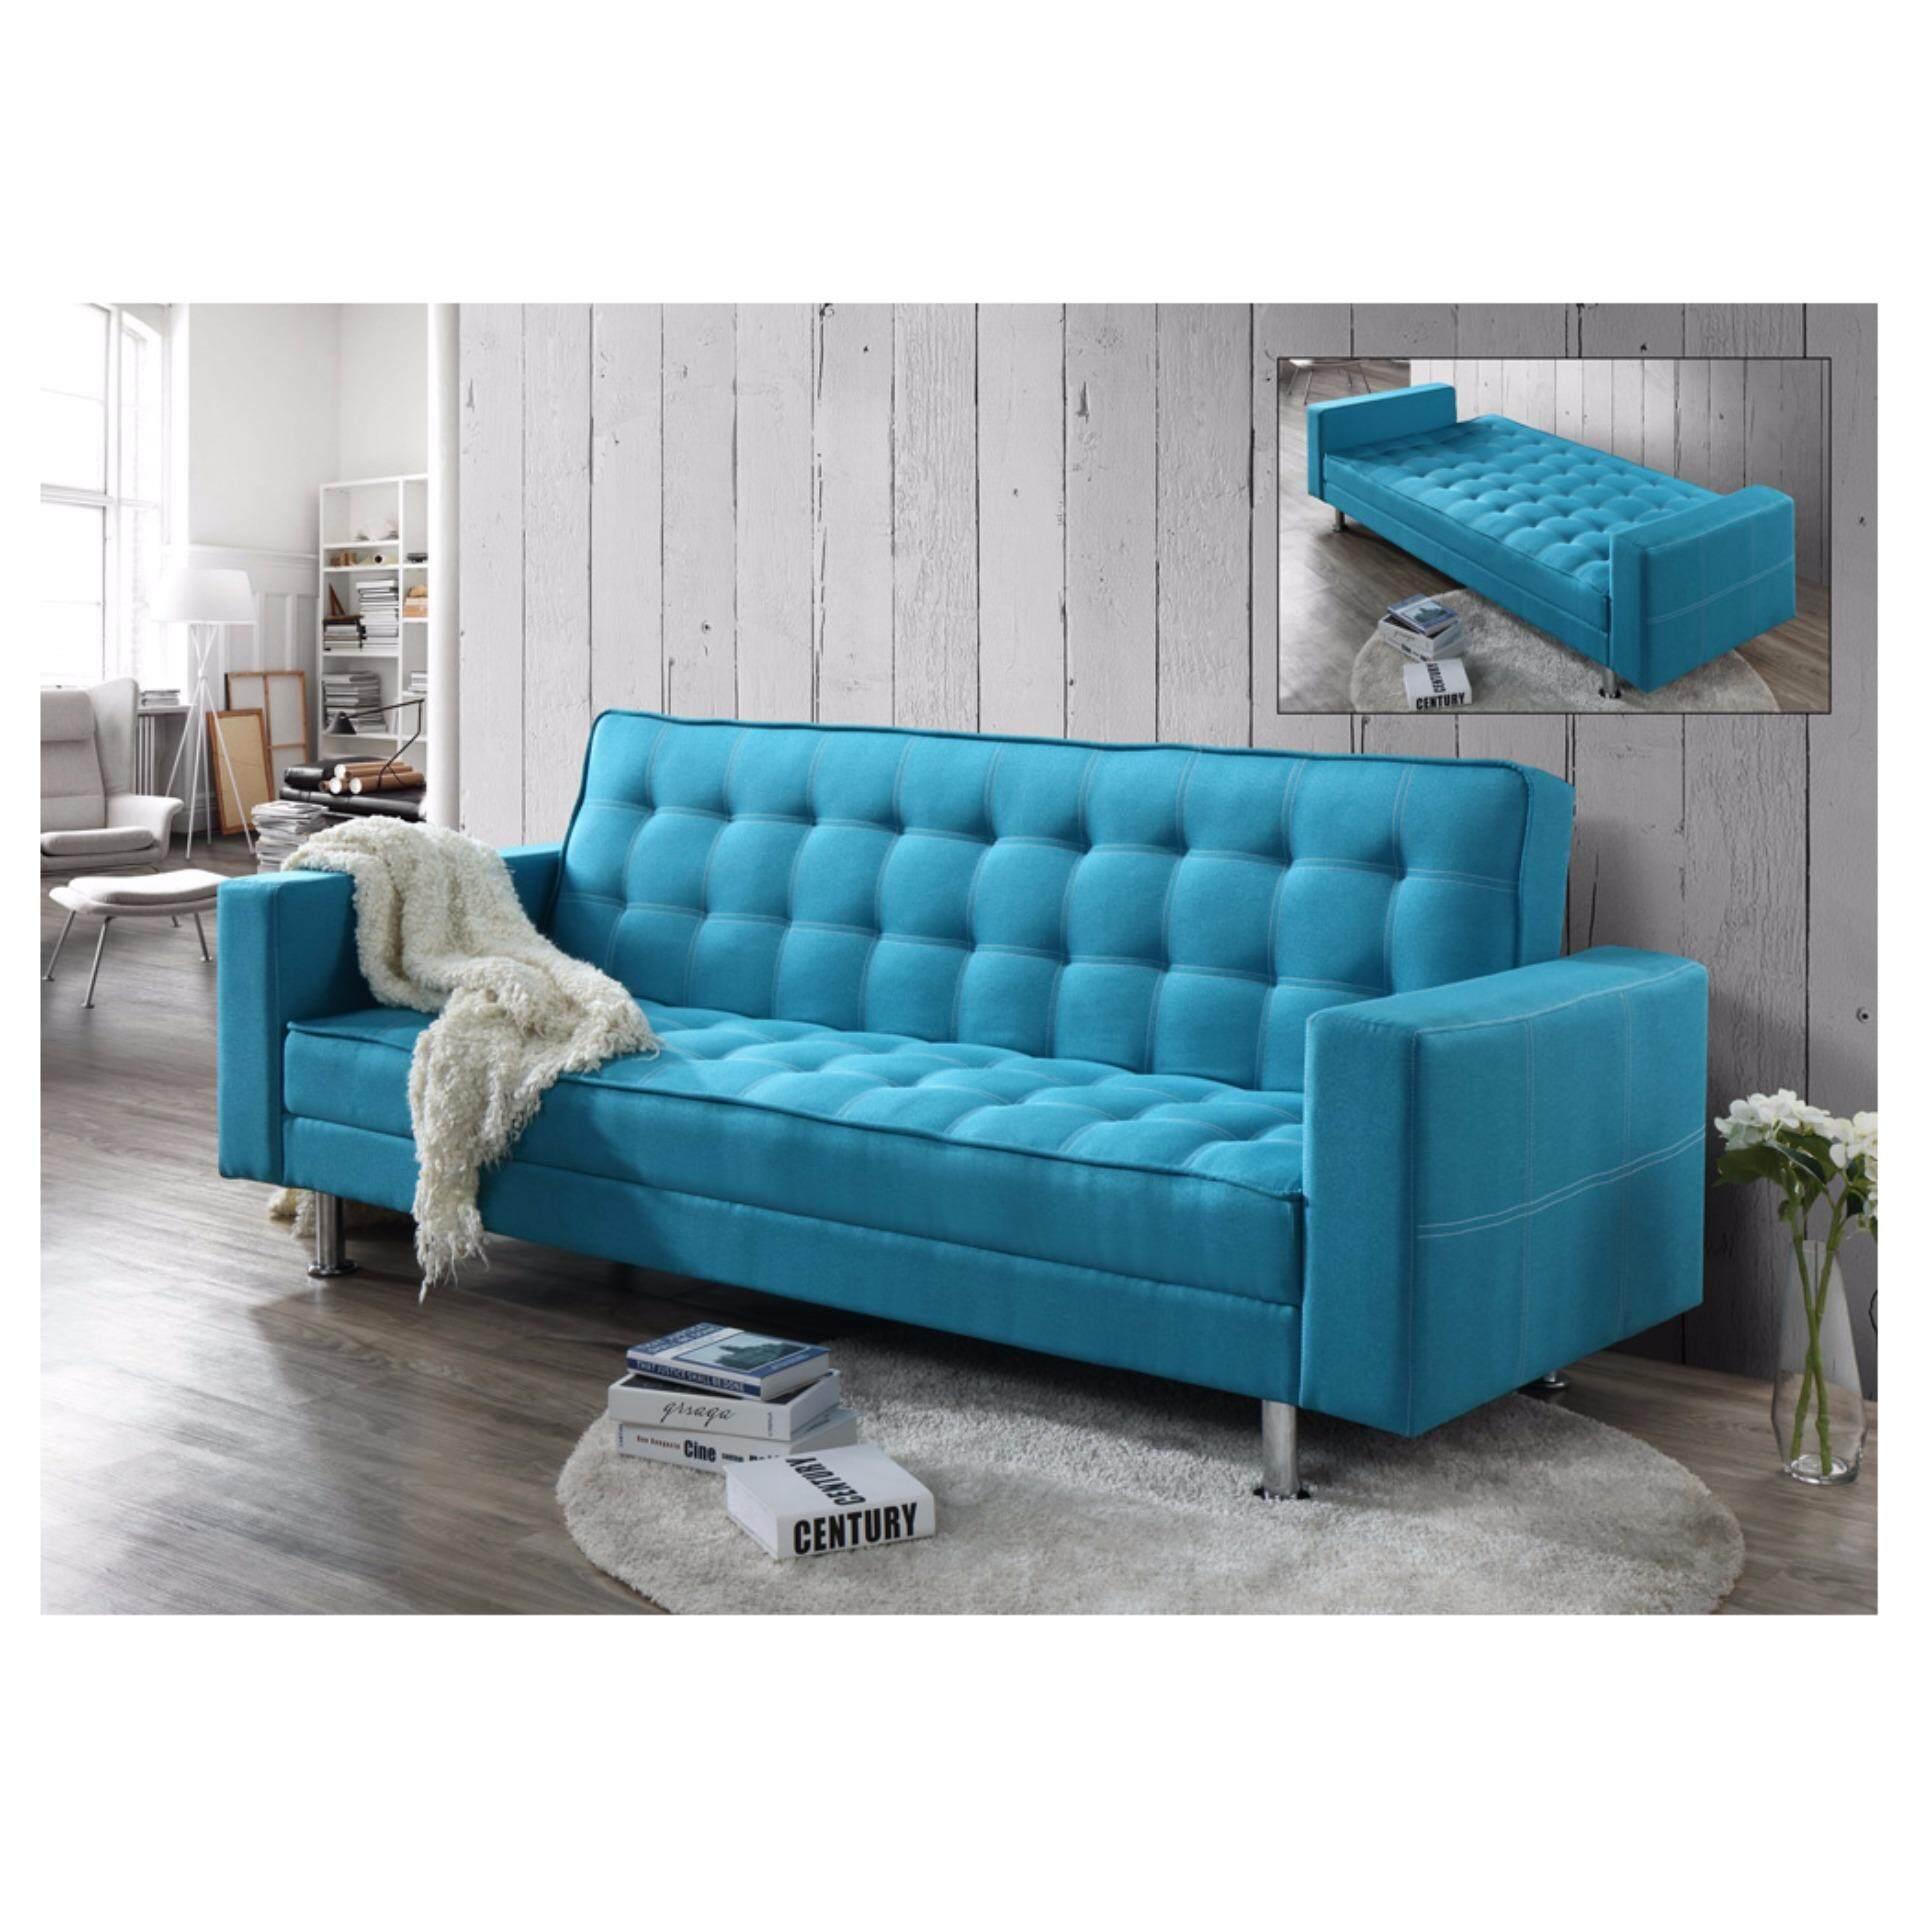 GF TIFFANY BLUE SOFA BED   Lazada Malaysia